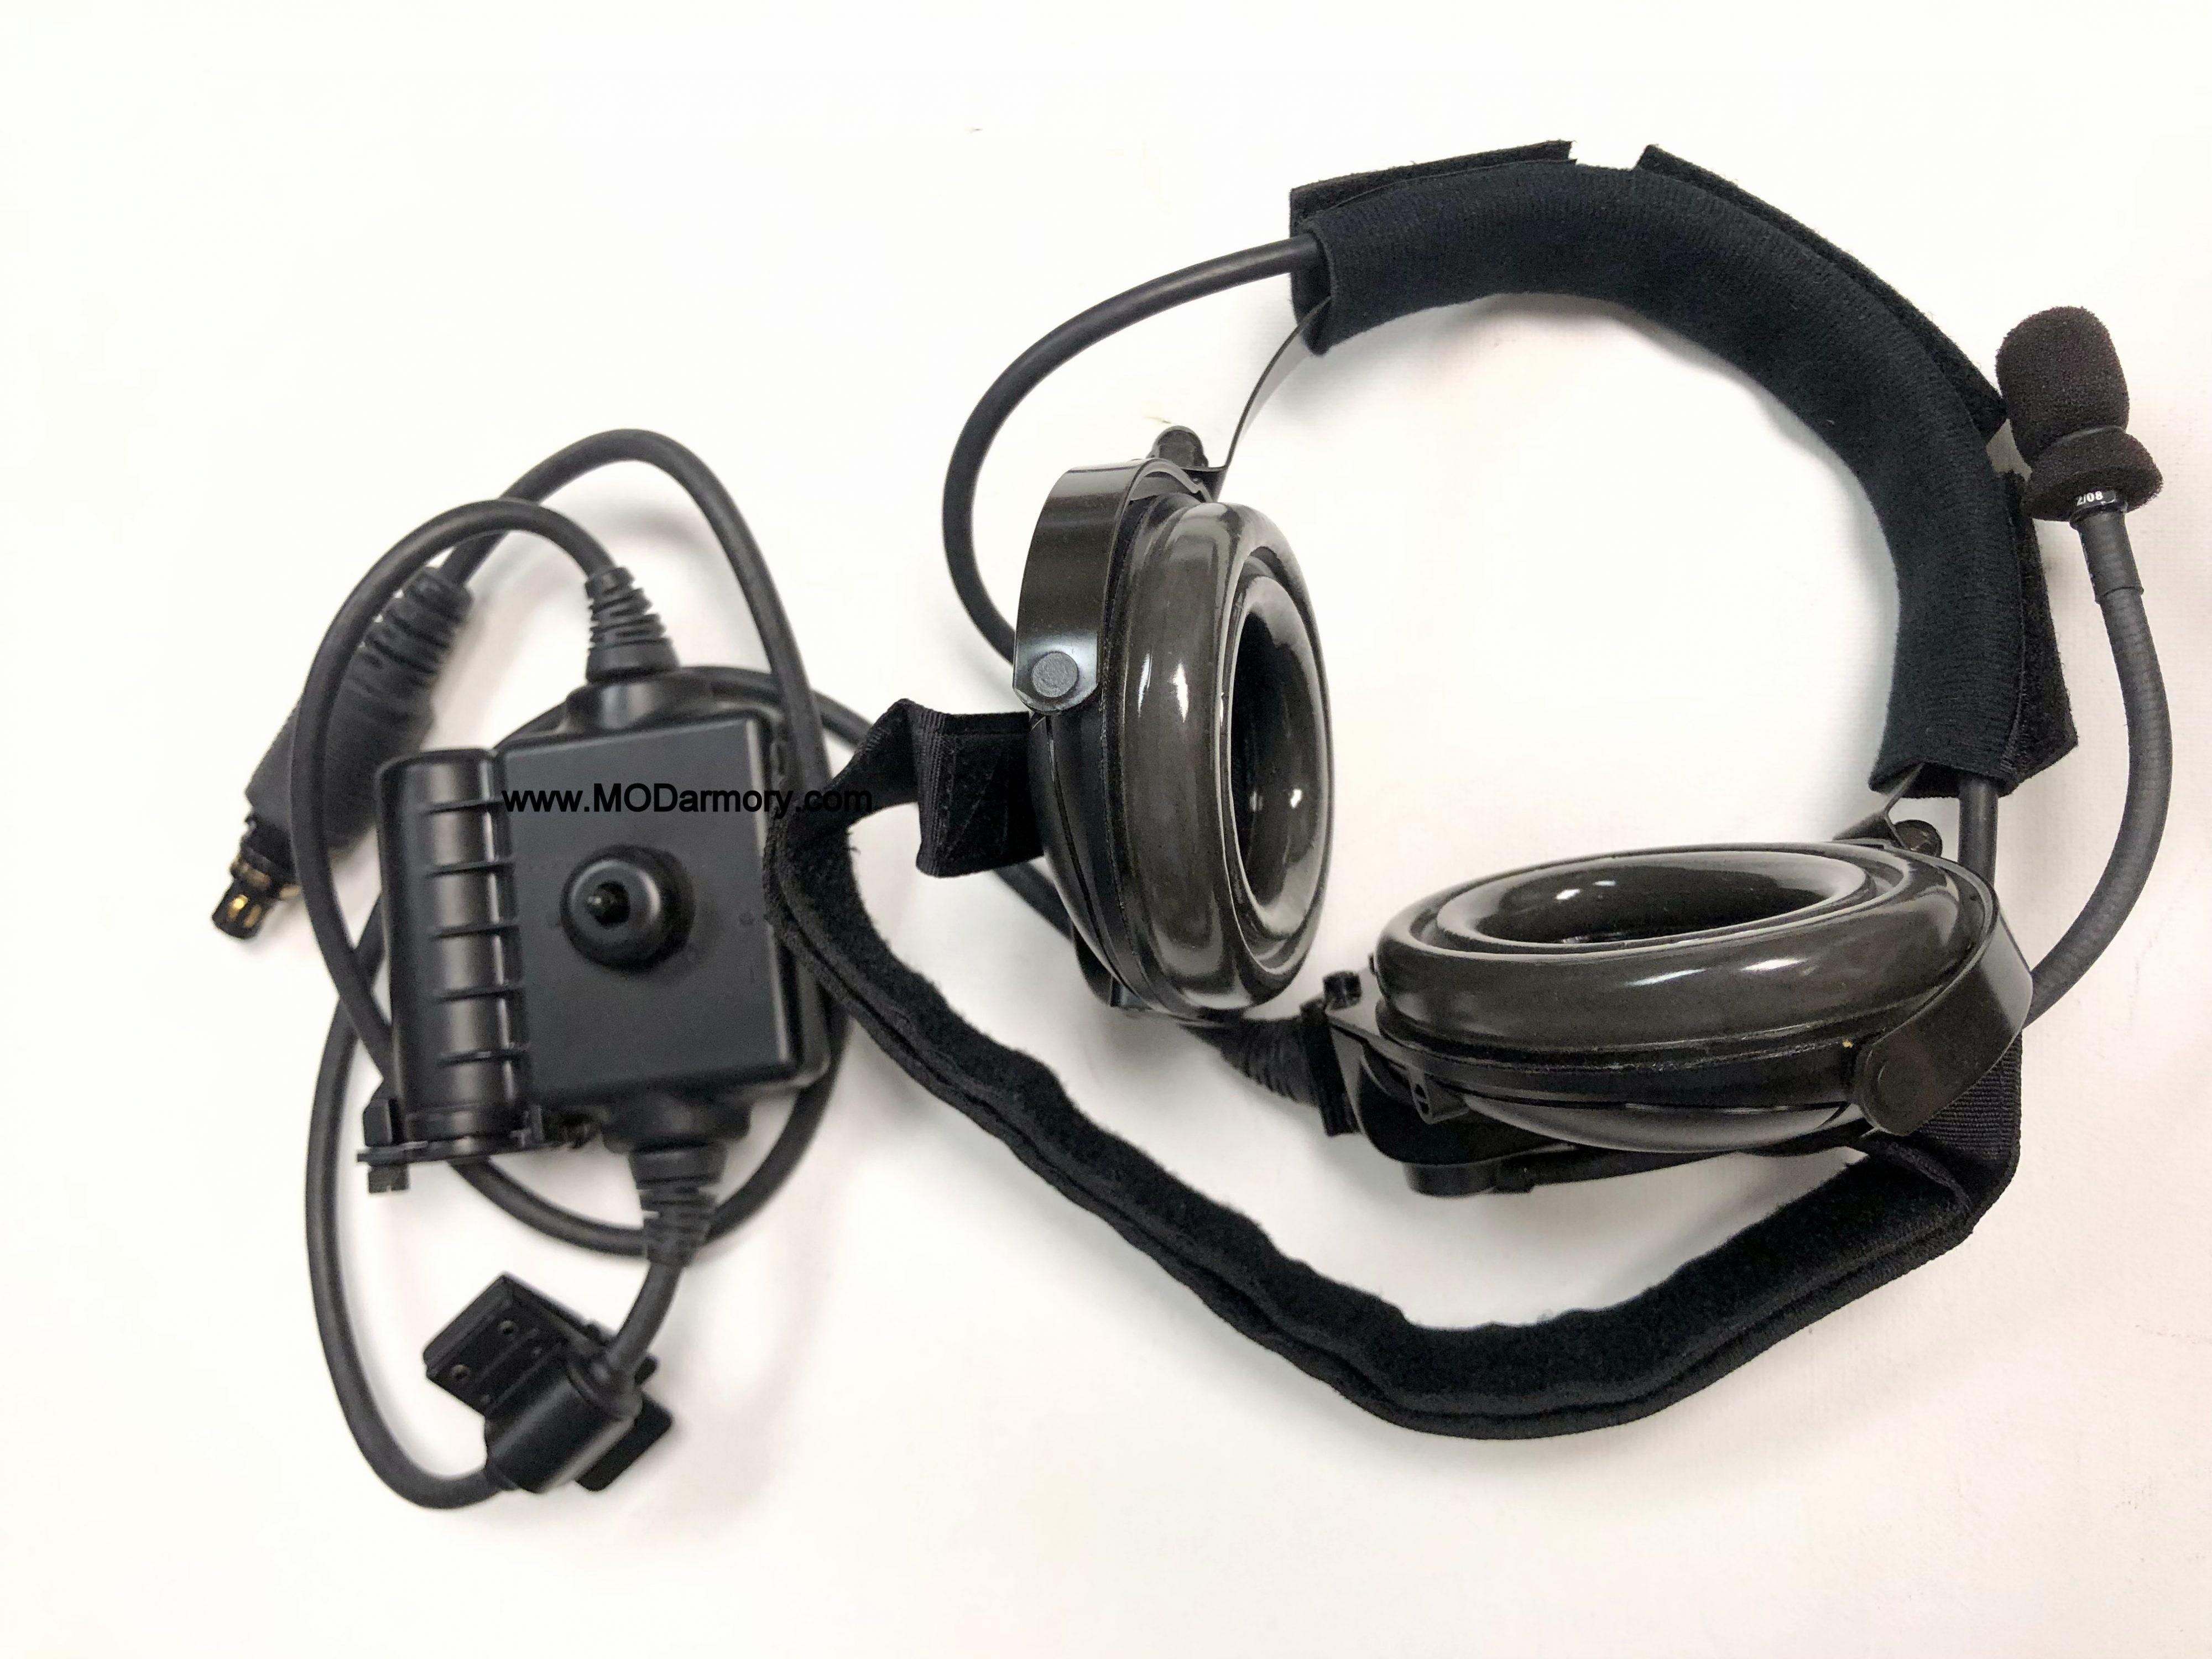 Bose Triport Tactical Communication Headset